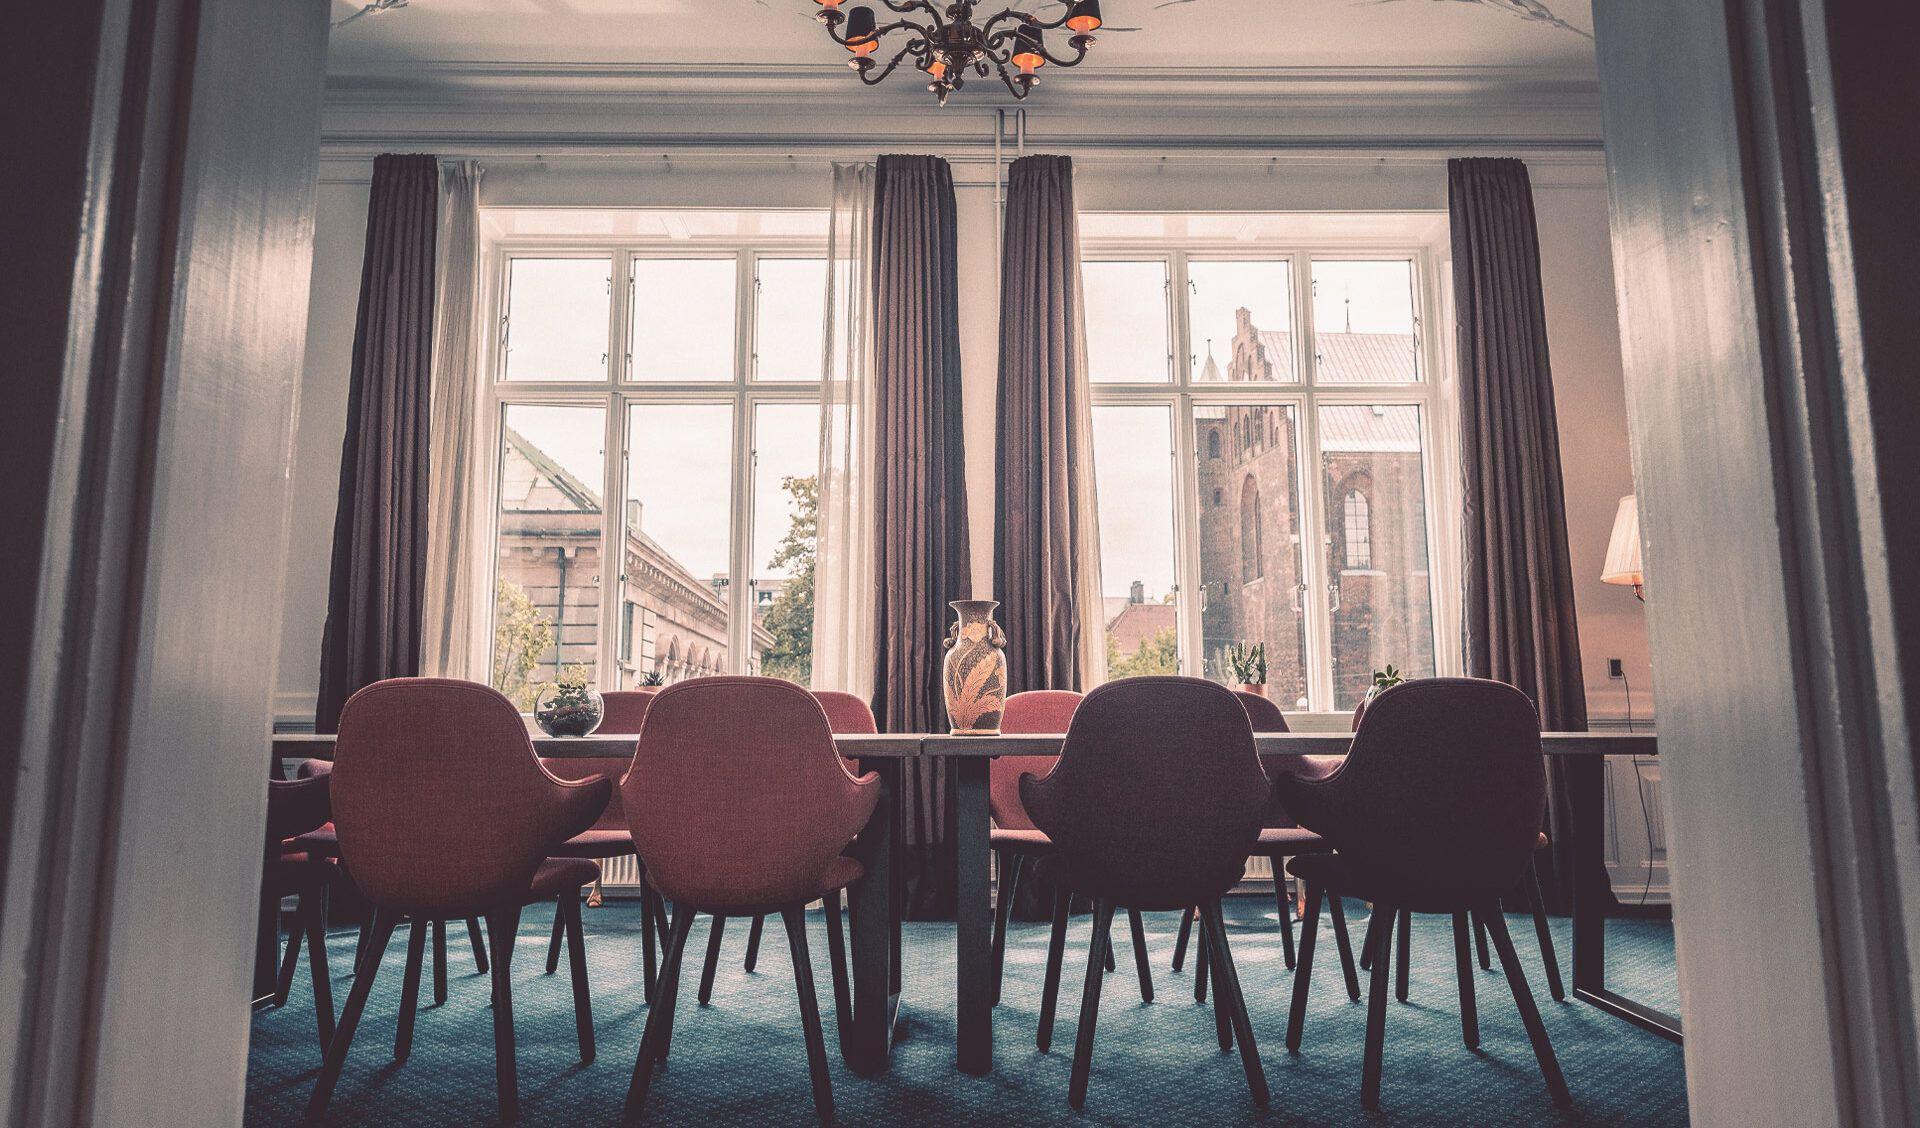 Rosen suiten – Hotel ROYALs selskabs lokale